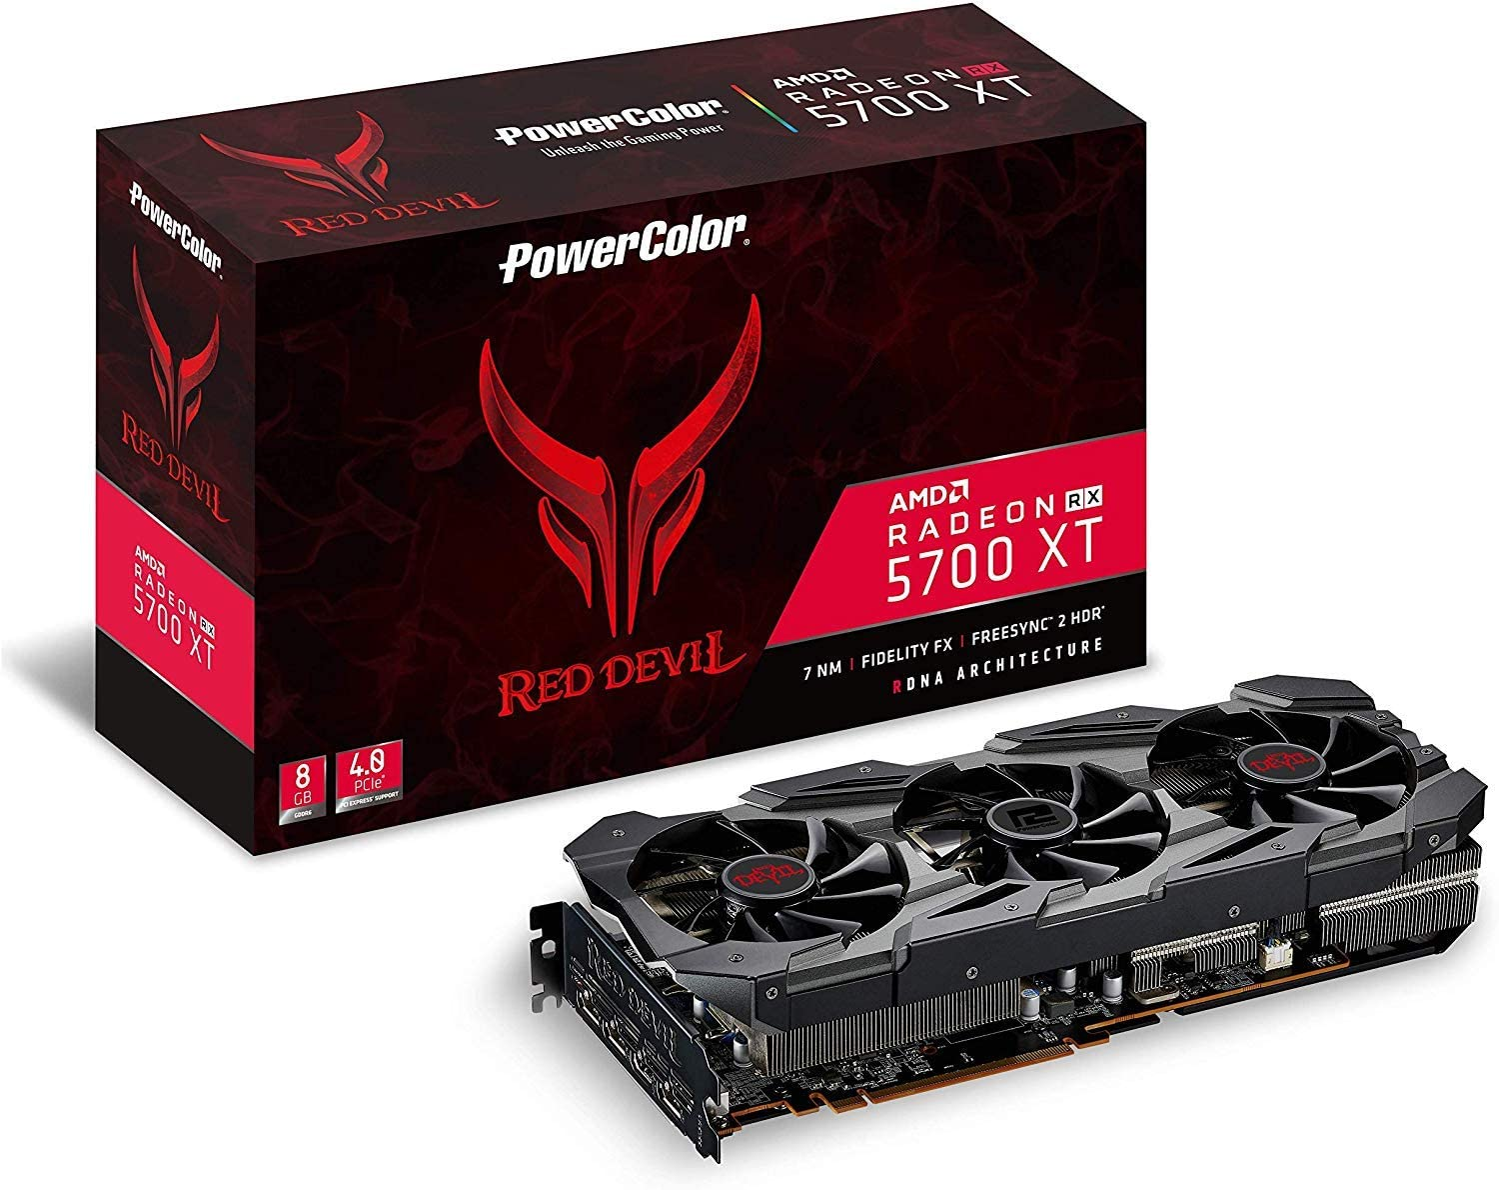 Mint Condition! RX 580 8GB GDDR5  PowerColor Red Devil Radeon